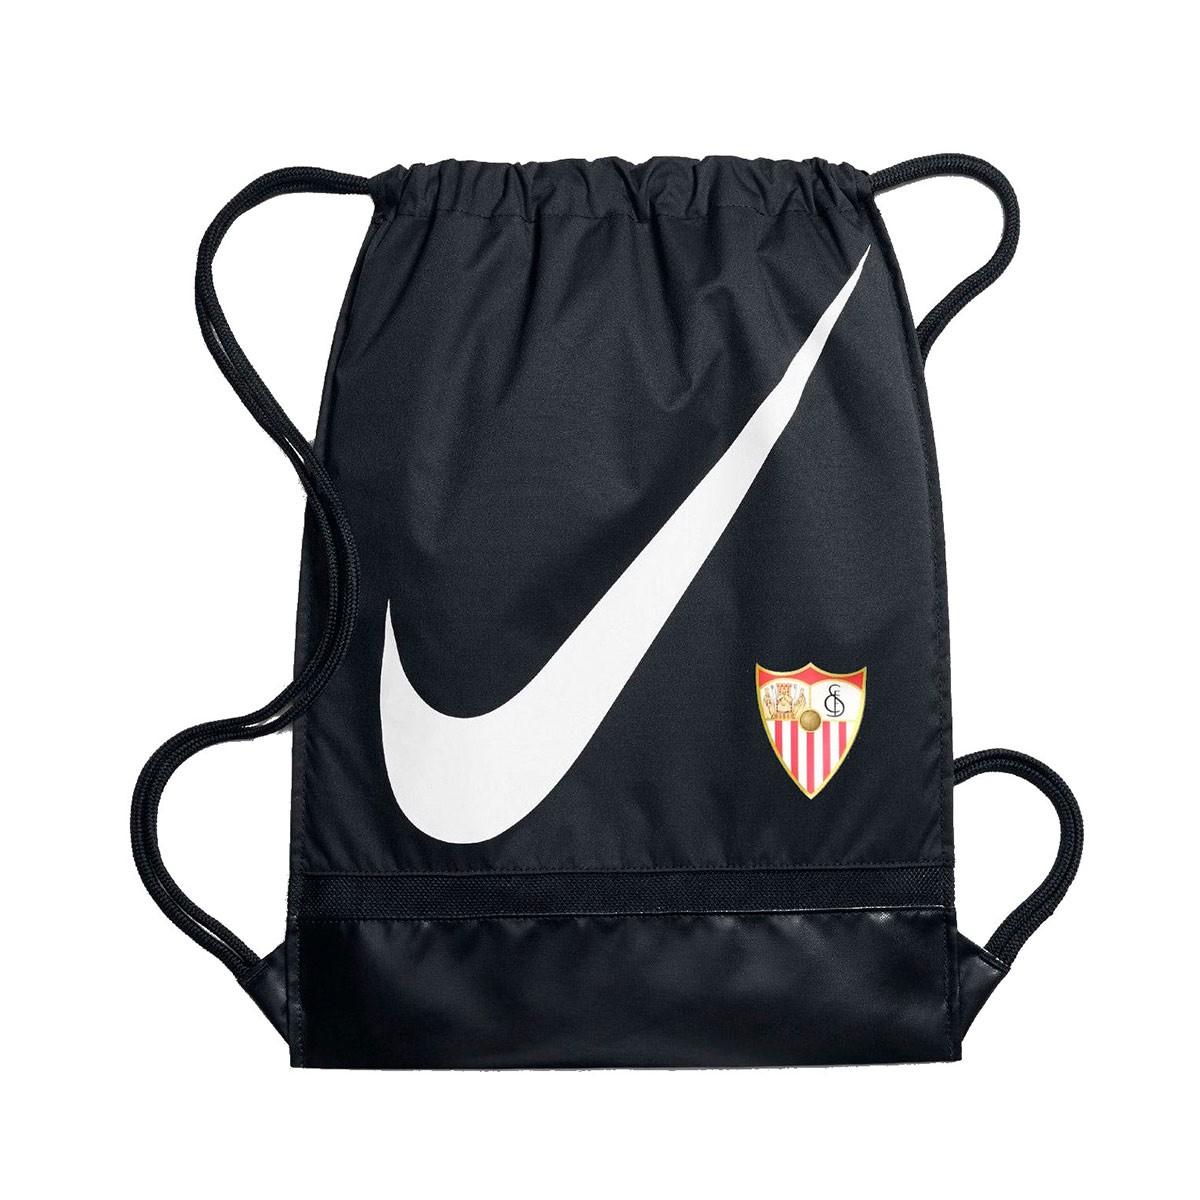 Gymsack Fc Nike Tienda De Black Bolsa Sevilla 2018 Fútbol 2019 zMqSUVp